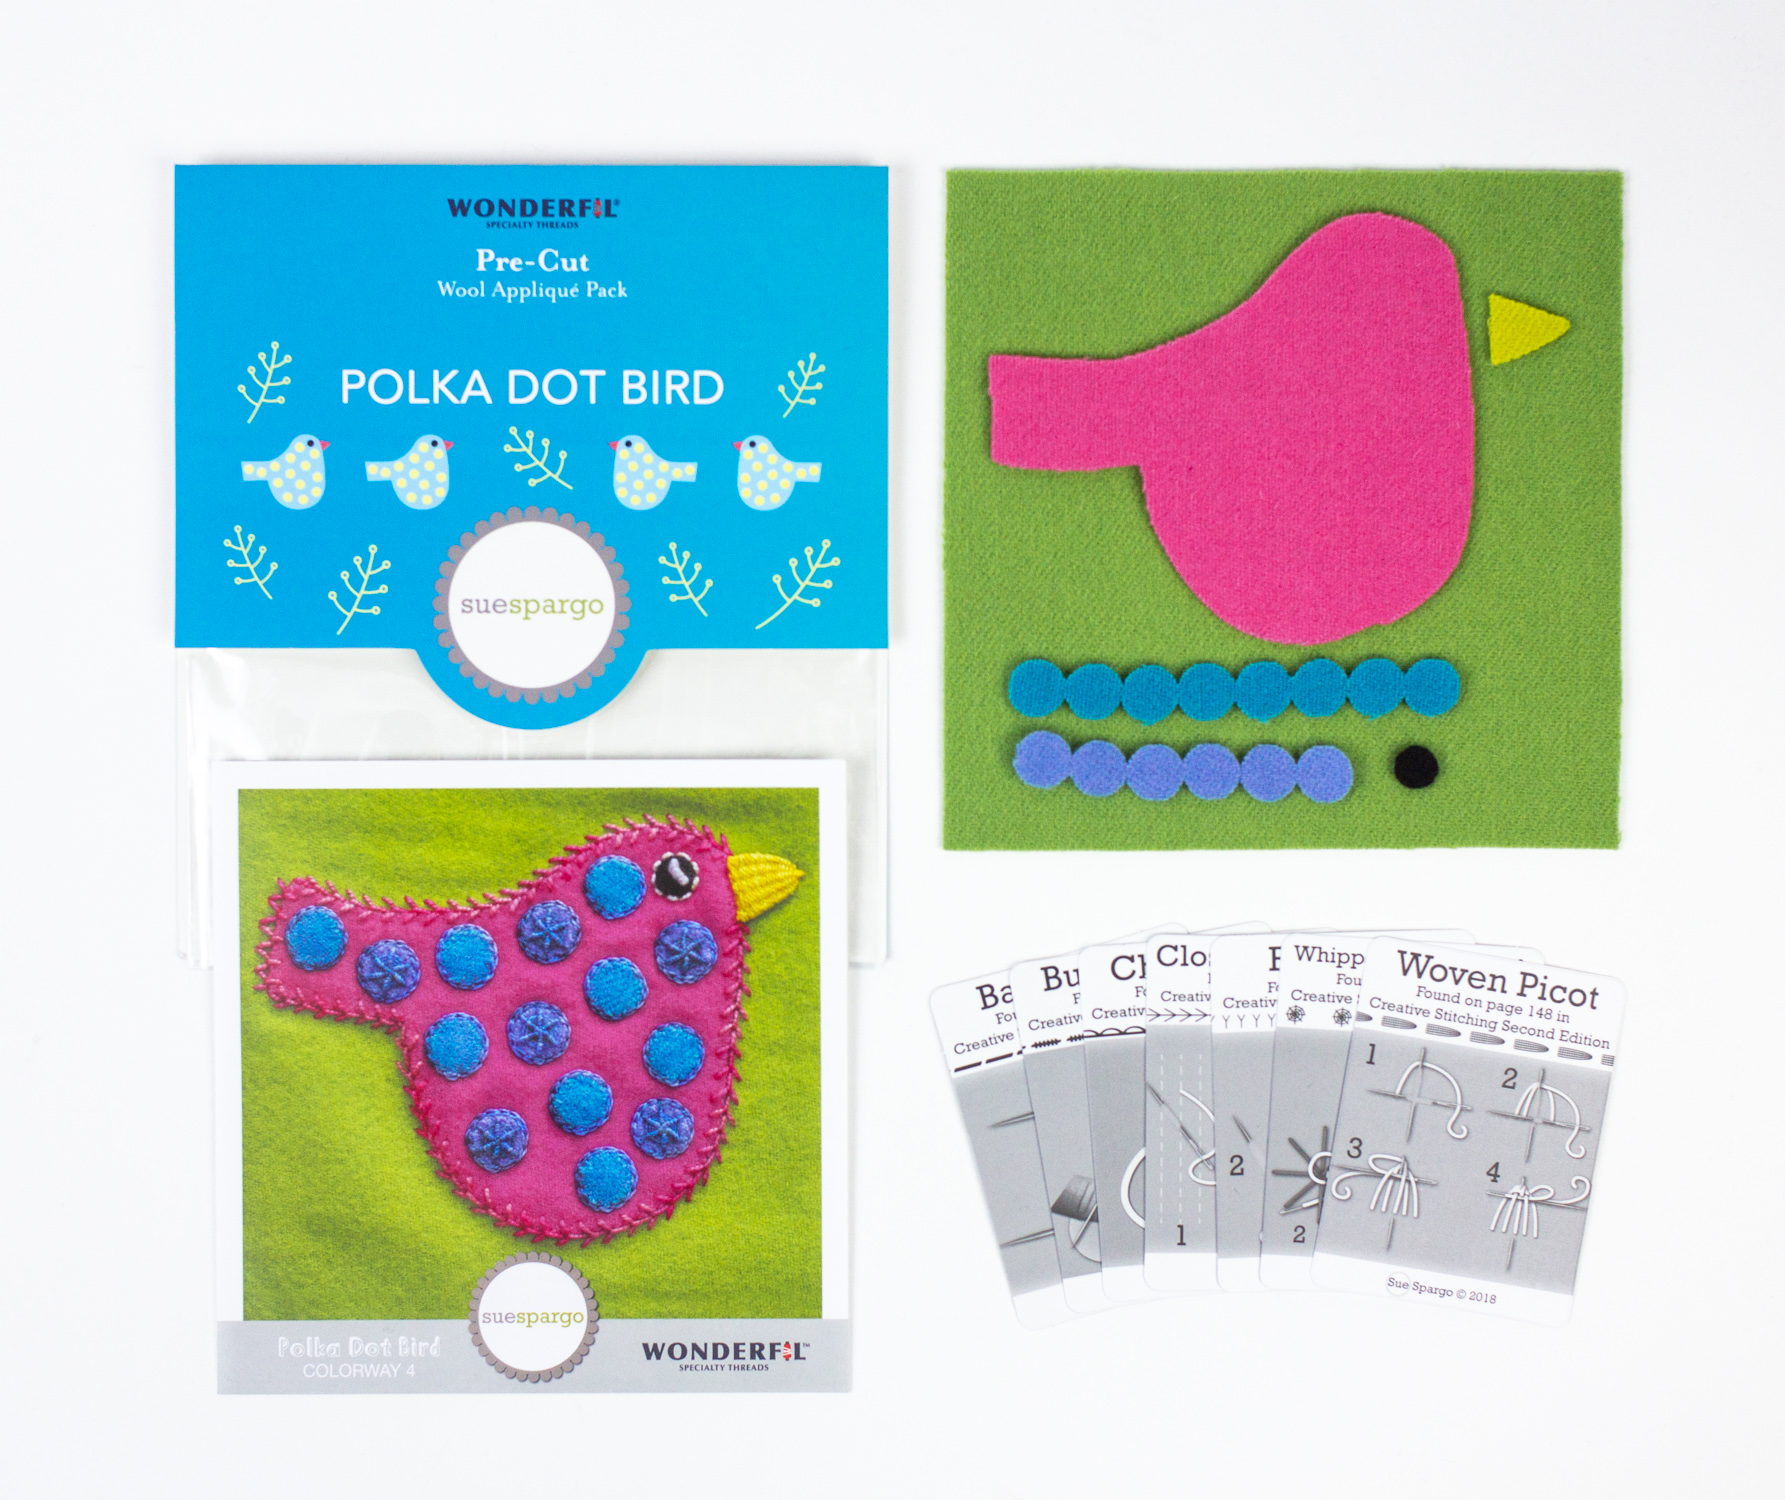 Polka Dot Bird4-inside.jpg